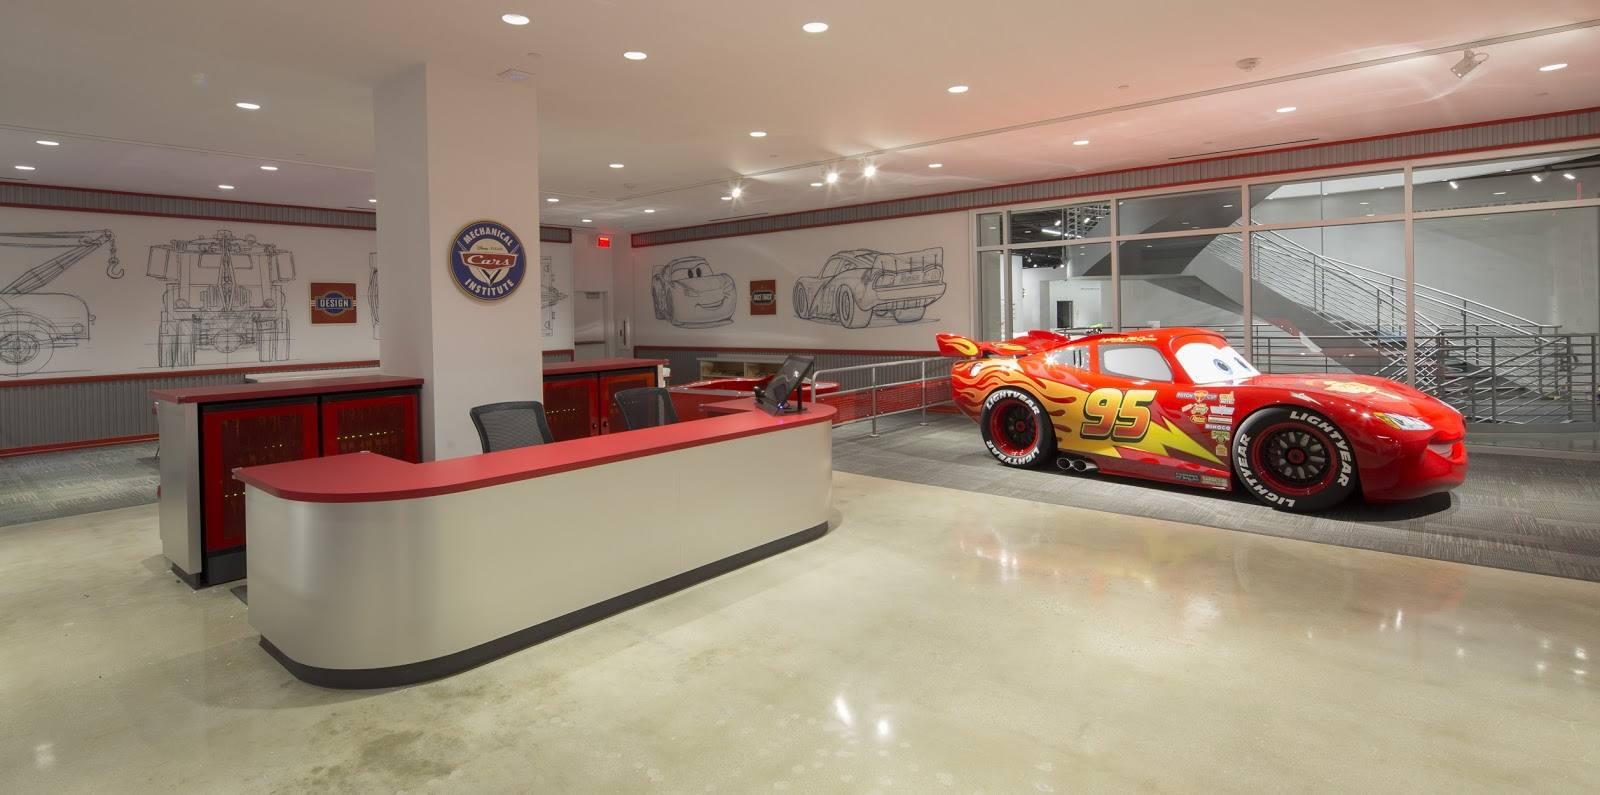 Disney/Pixar Cars Mechanical Institute at the Petersen Automotive Museum